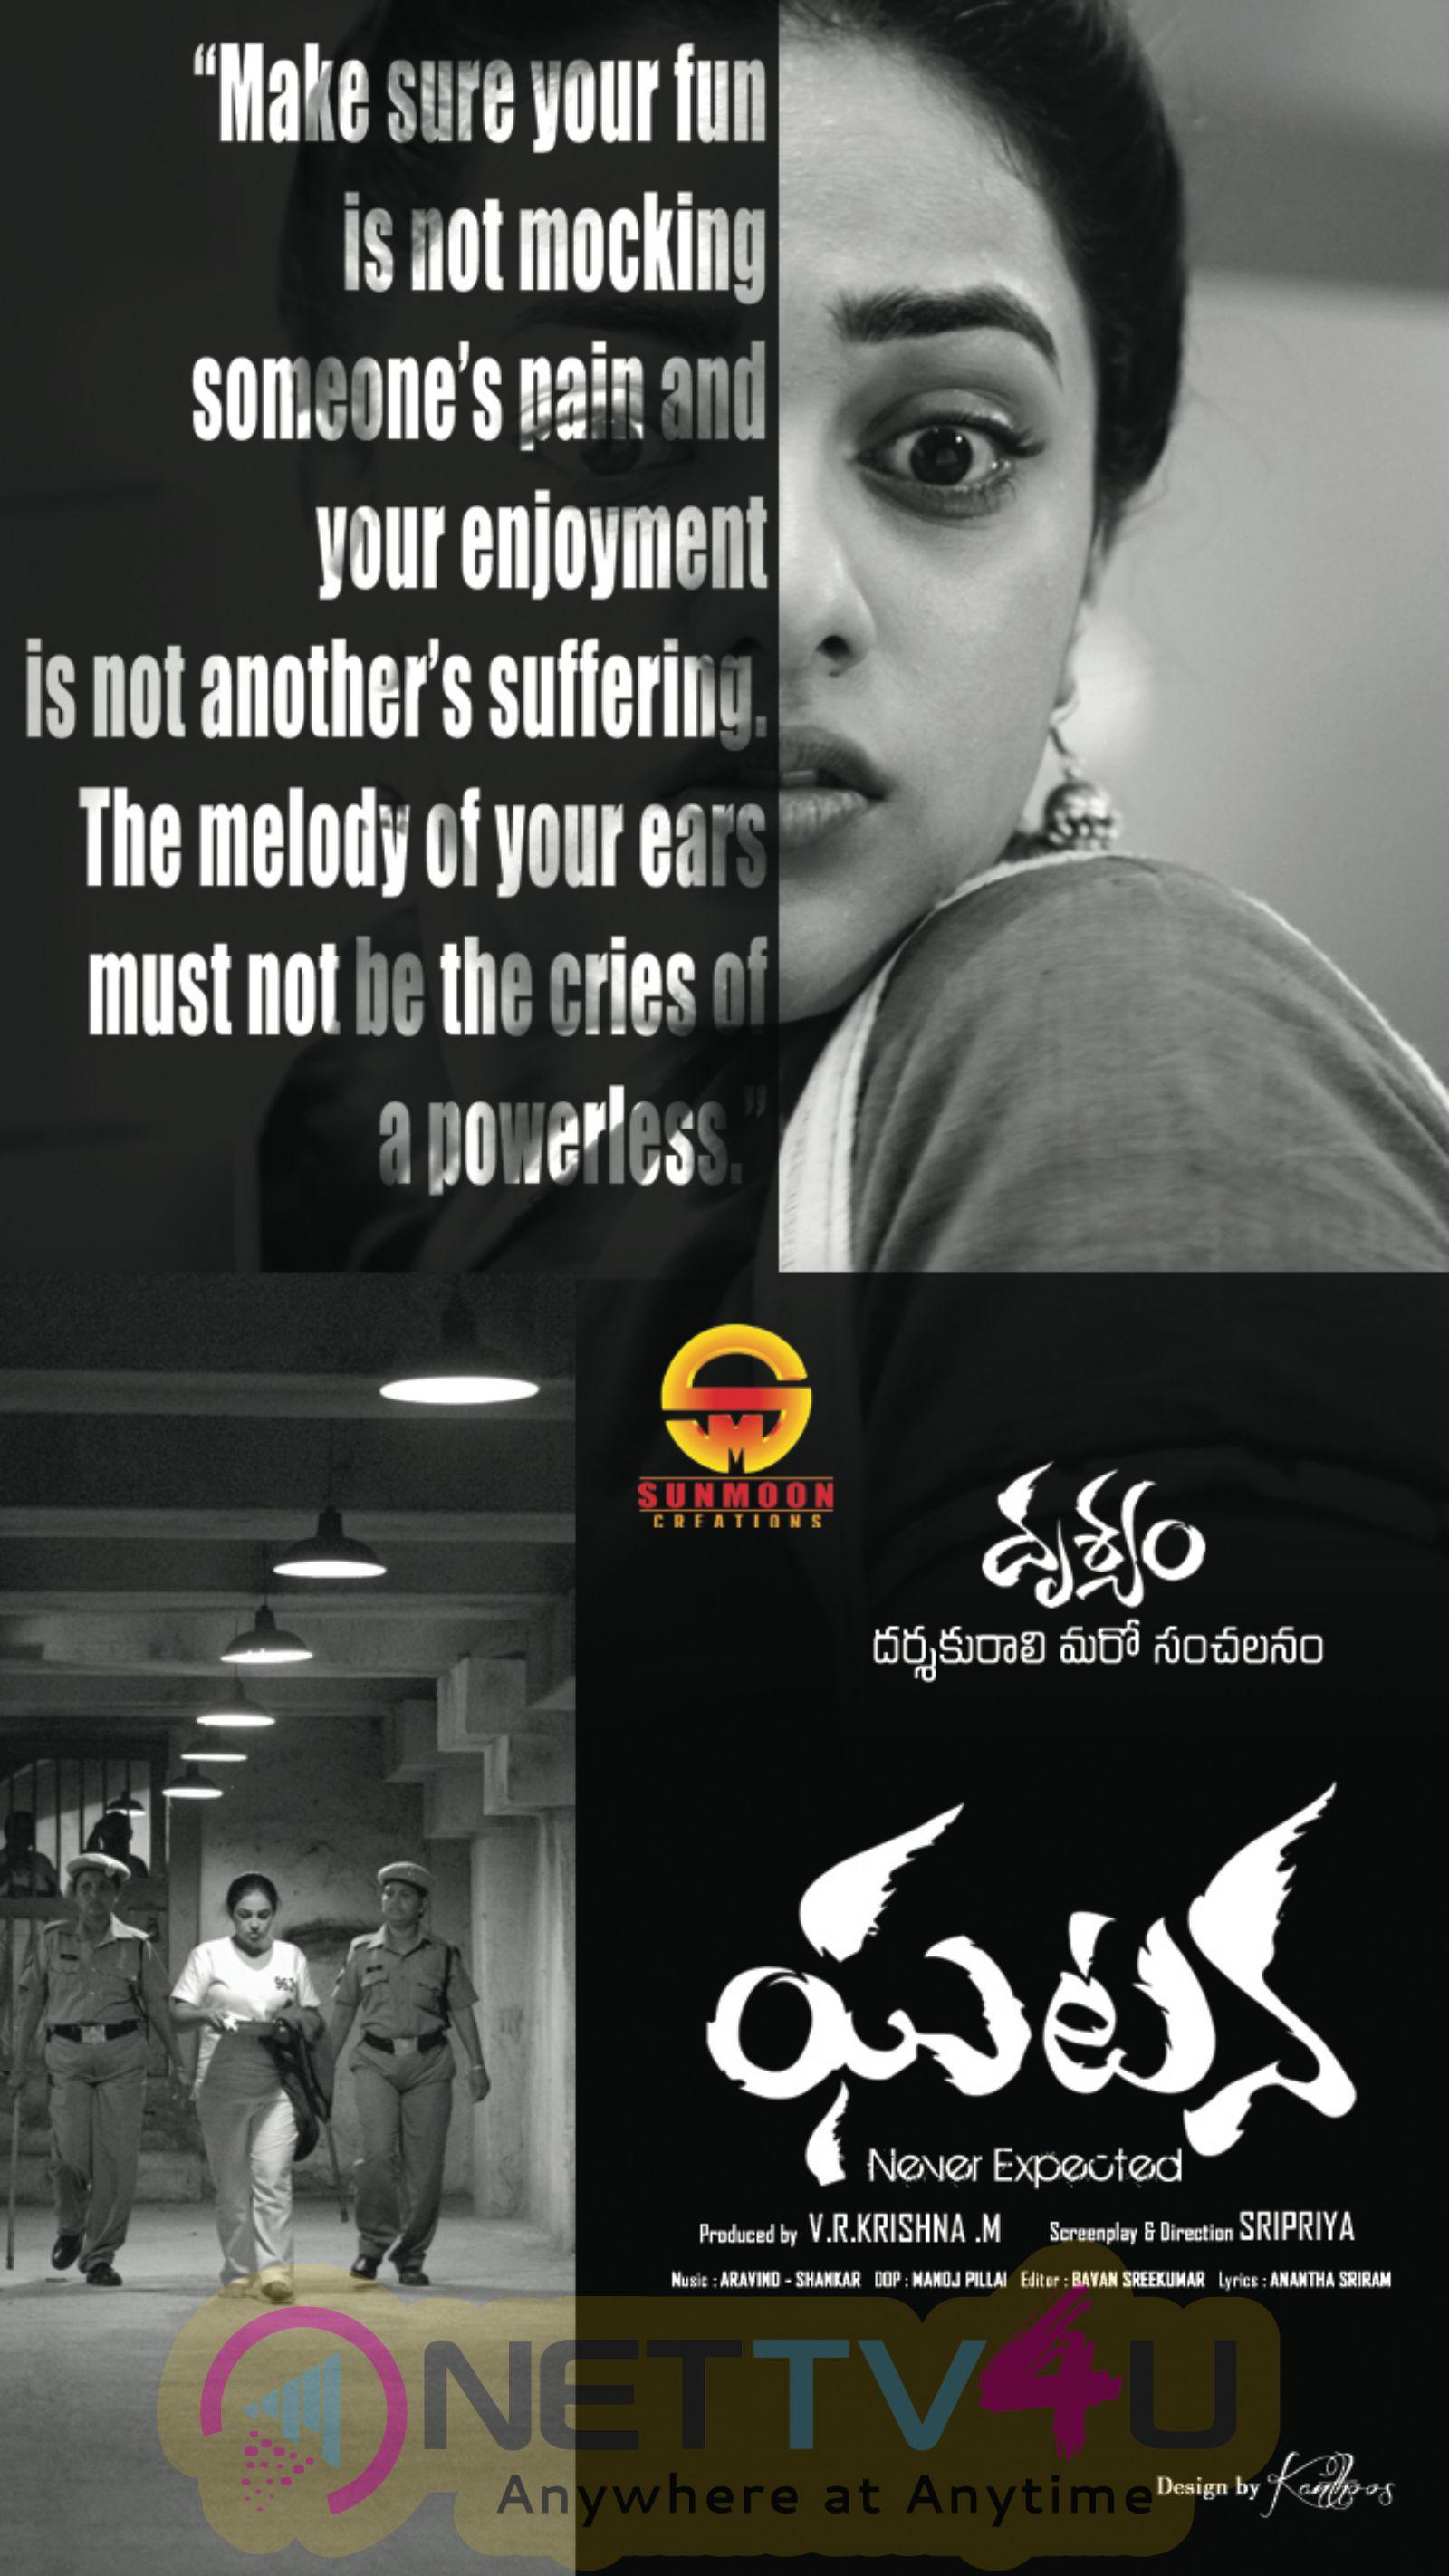 Telugu Movie Ghatana Attractive Stills & Posters